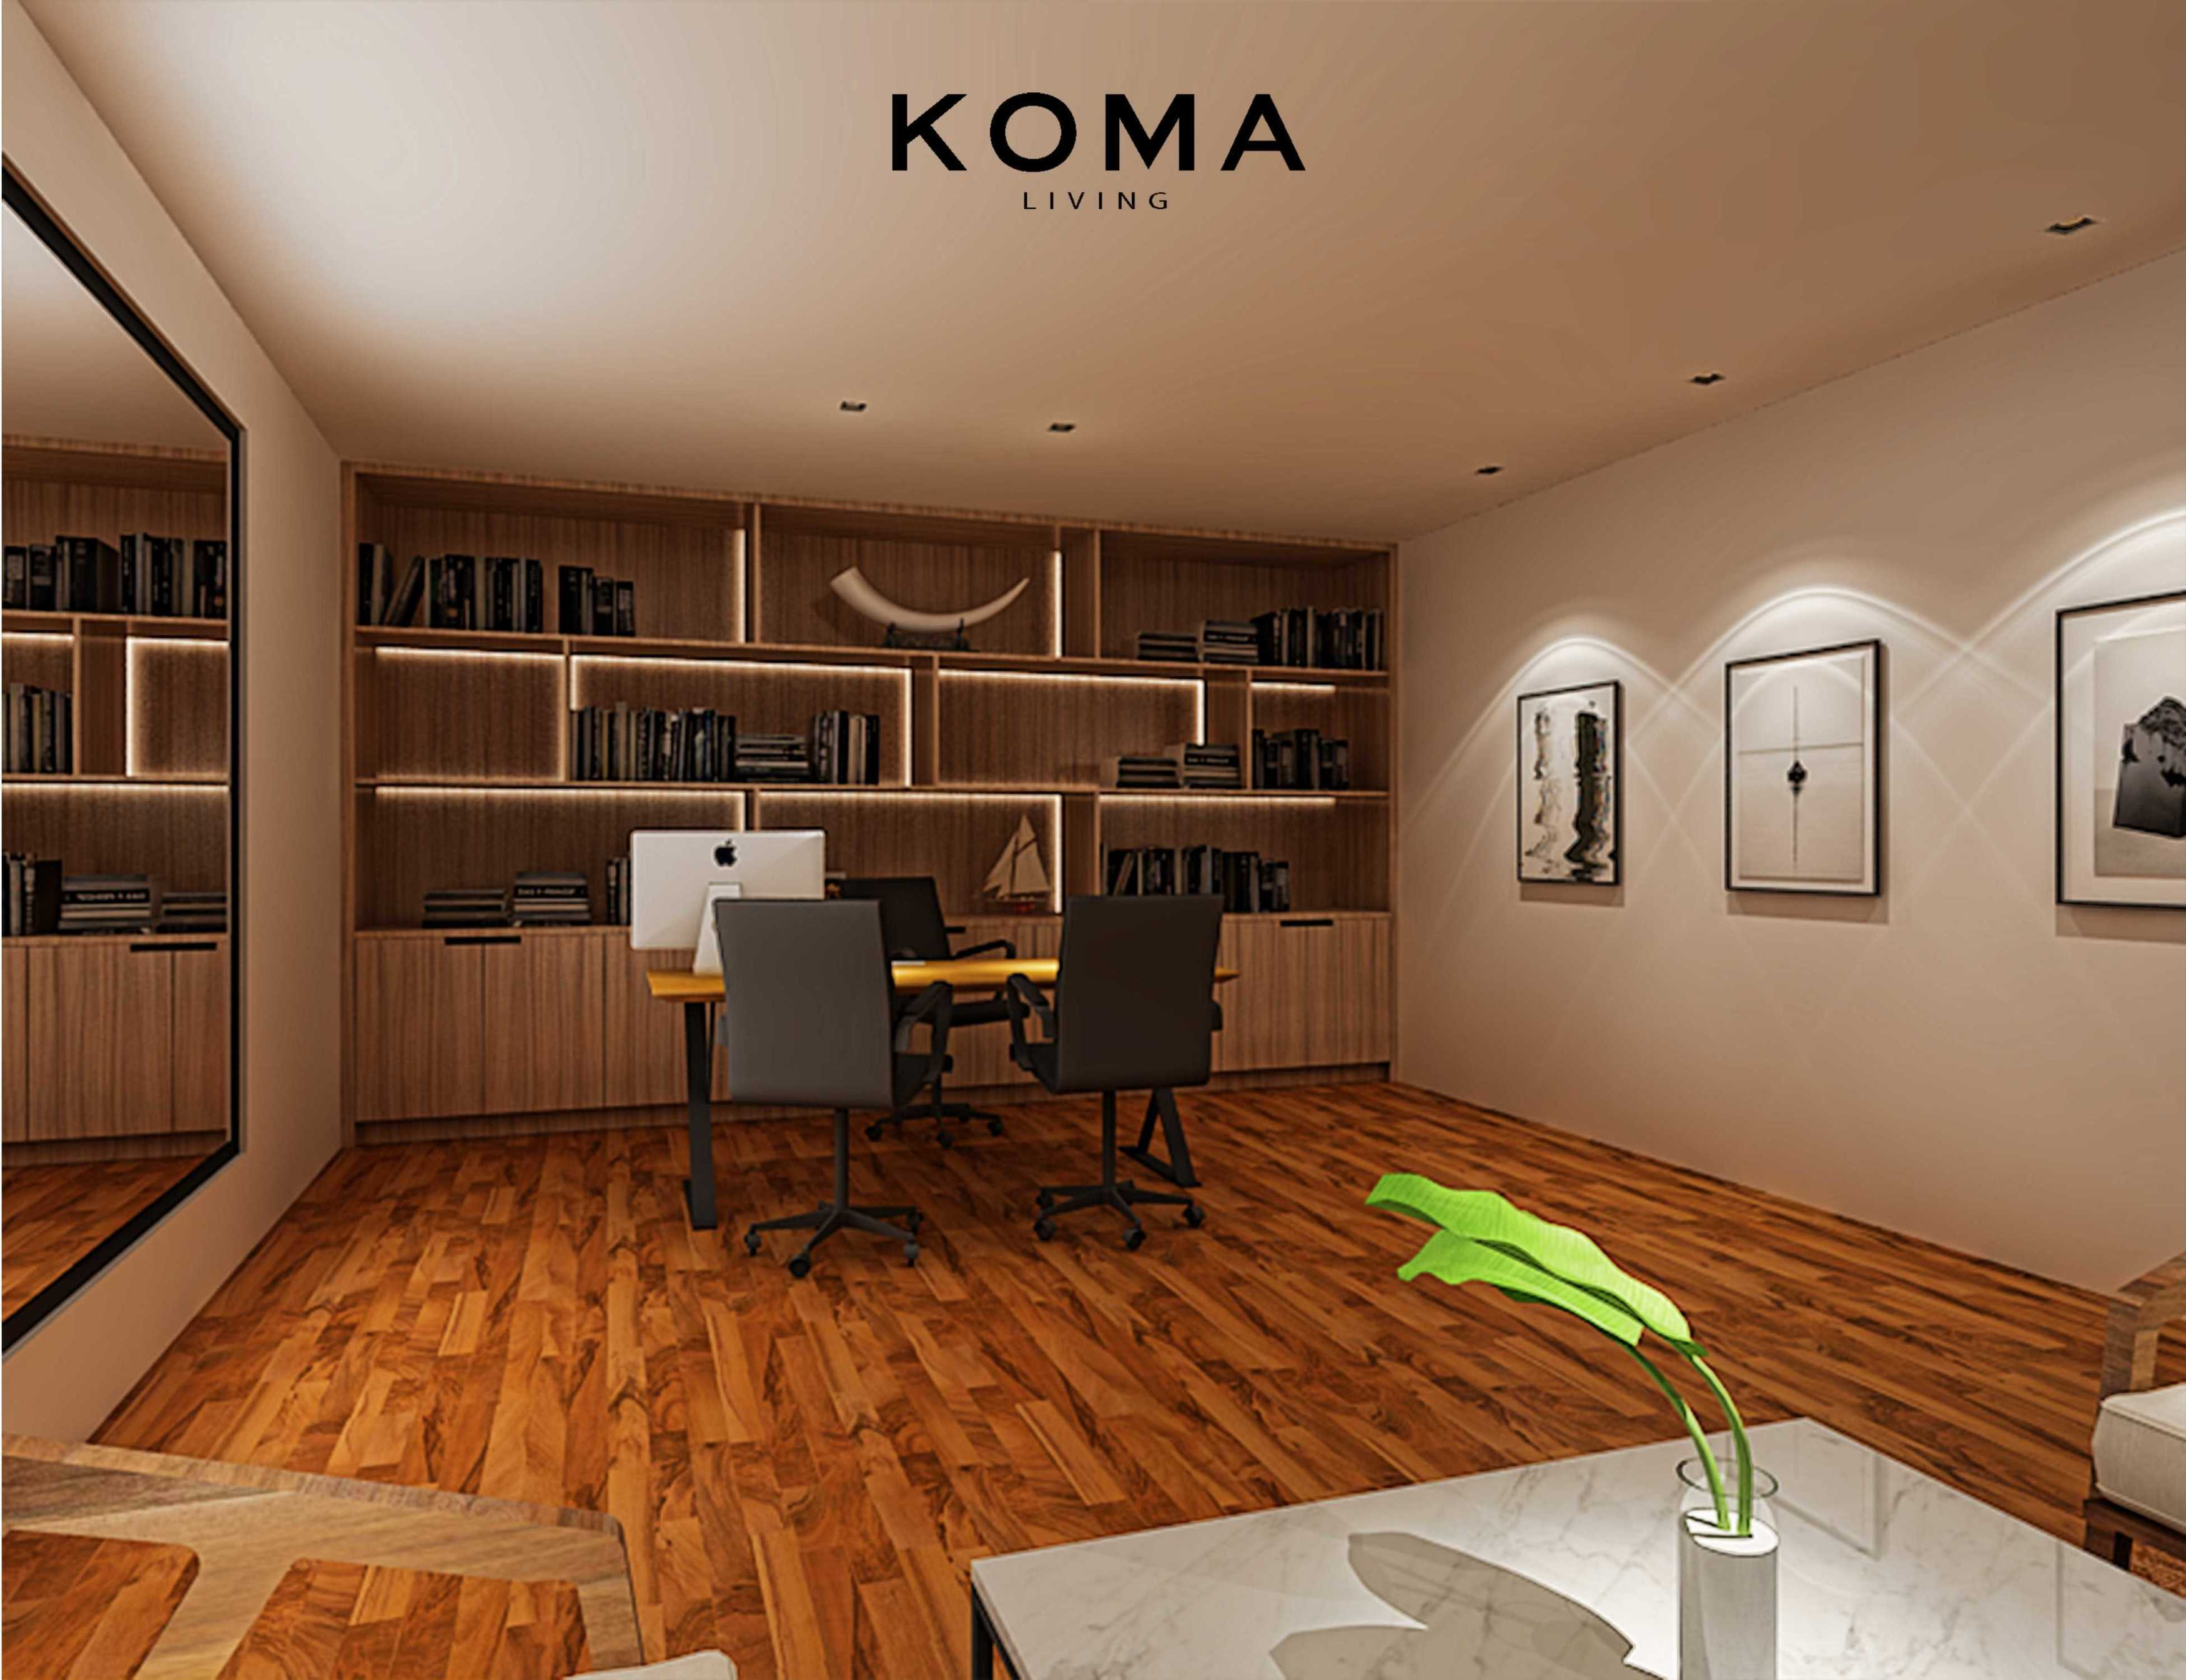 Koma Stt Office Papua, Indonesia Papua, Indonesia Koma-Stt-Office Contemporary  70255